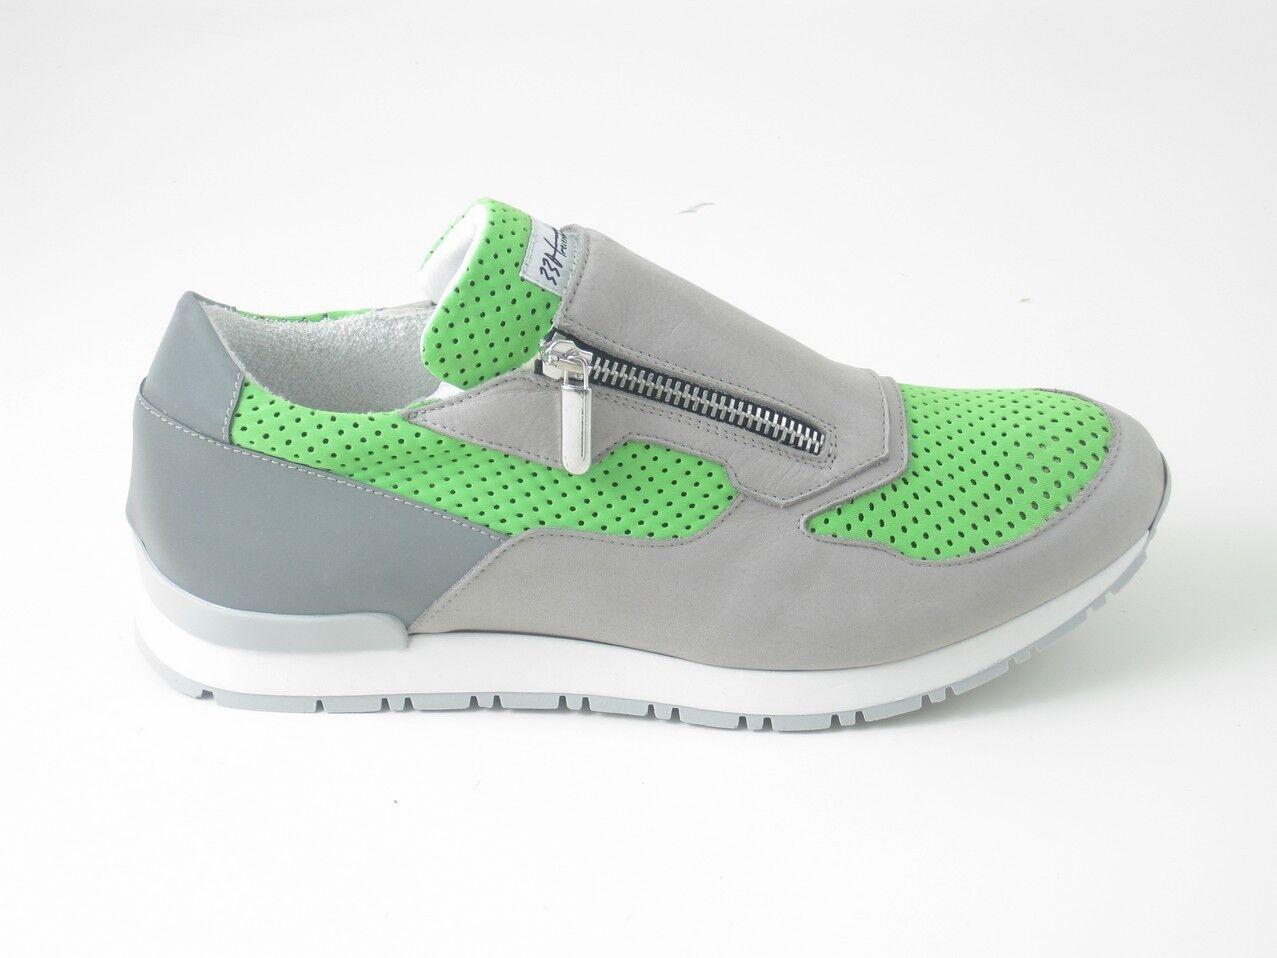 Schuhe Herren Turnschuhe Turnschuhe Grau grün Gr 42 Made in  Neu